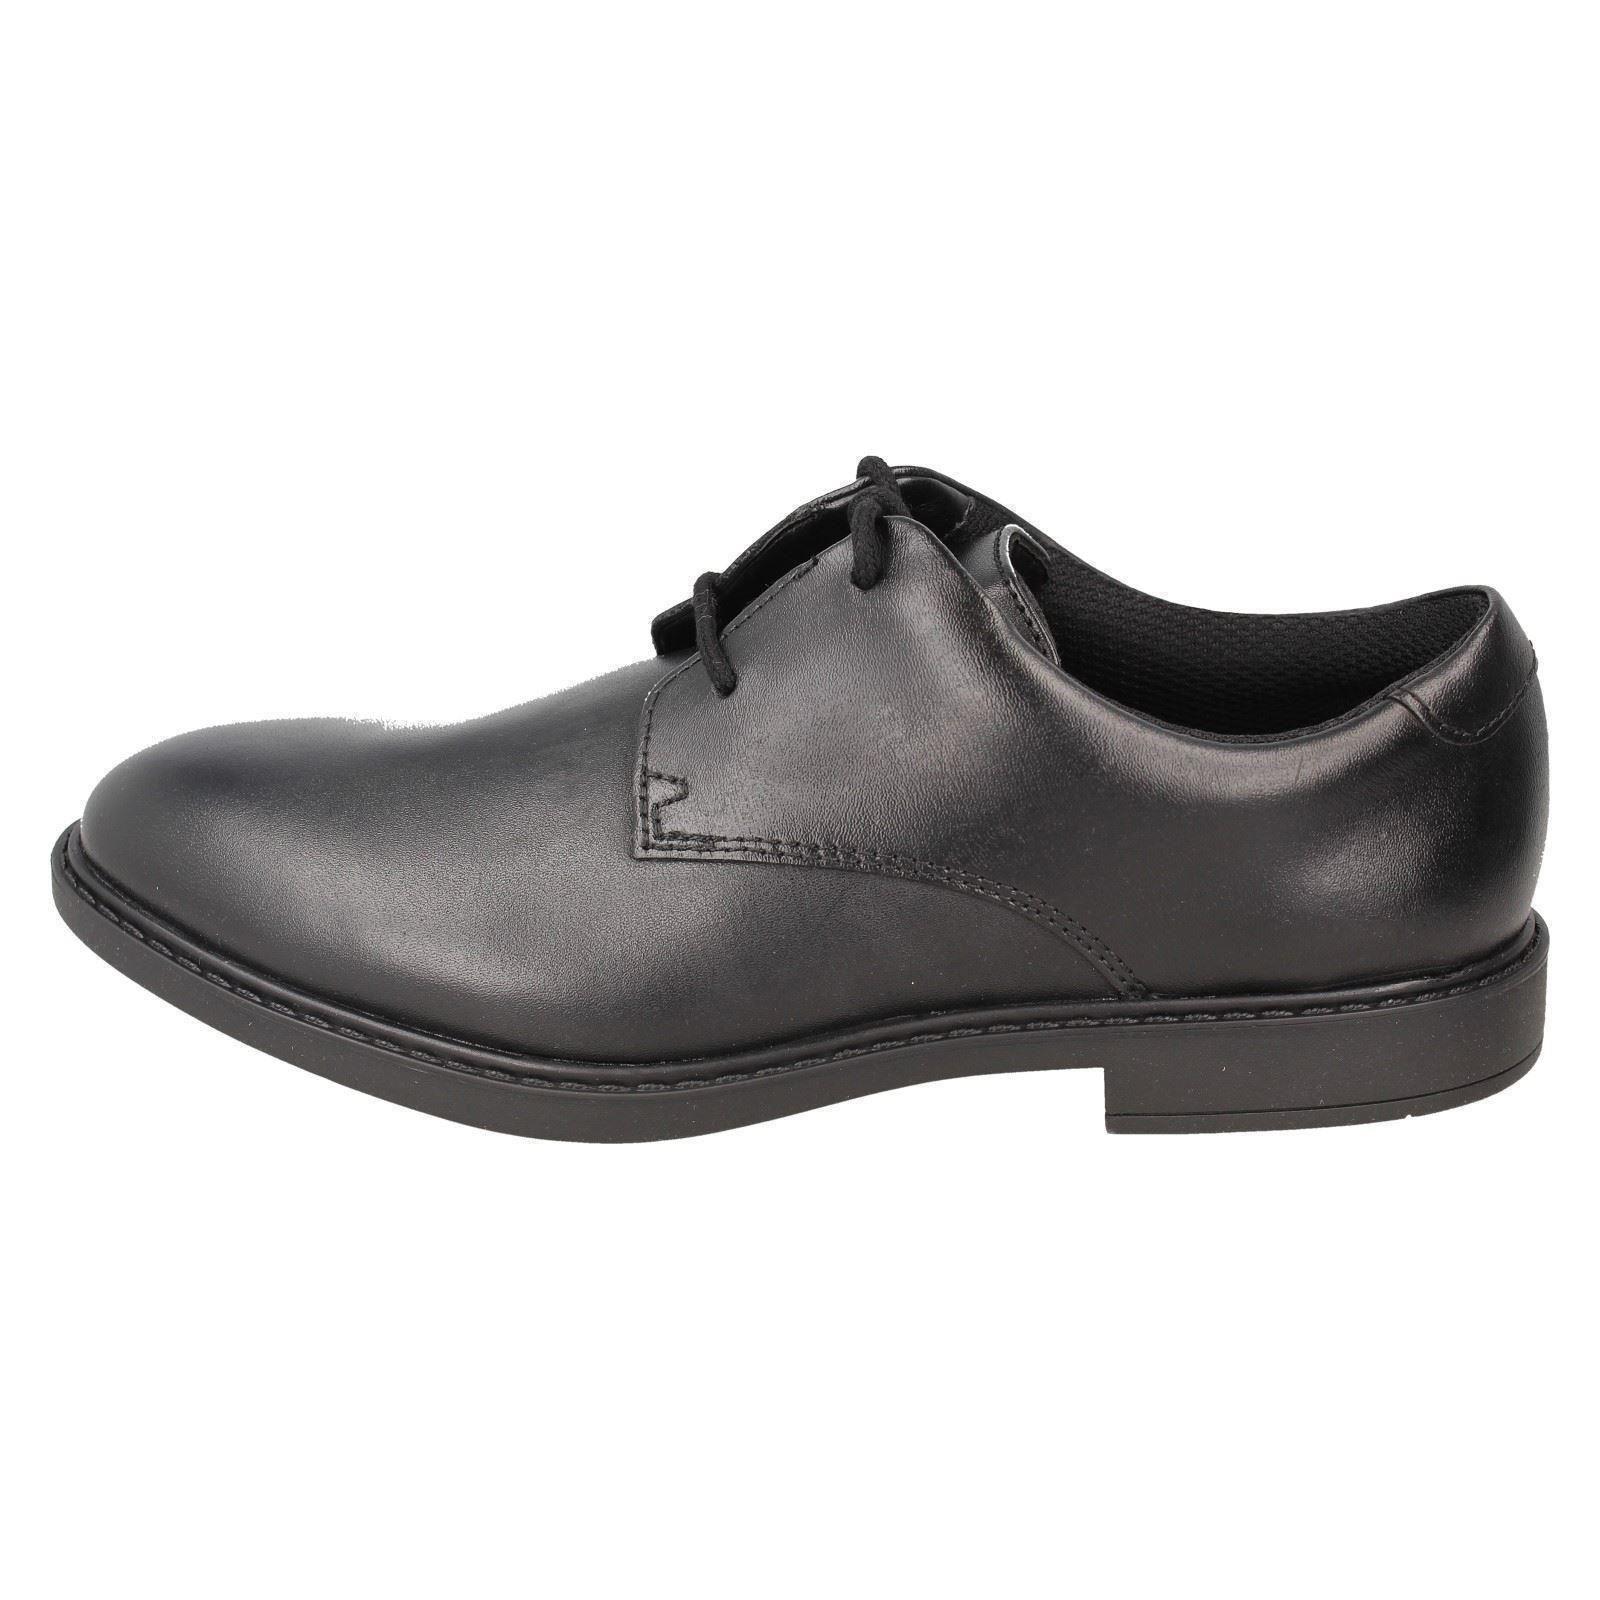 Boys Clarks Stylish Formal//School Shoes Scala Loop